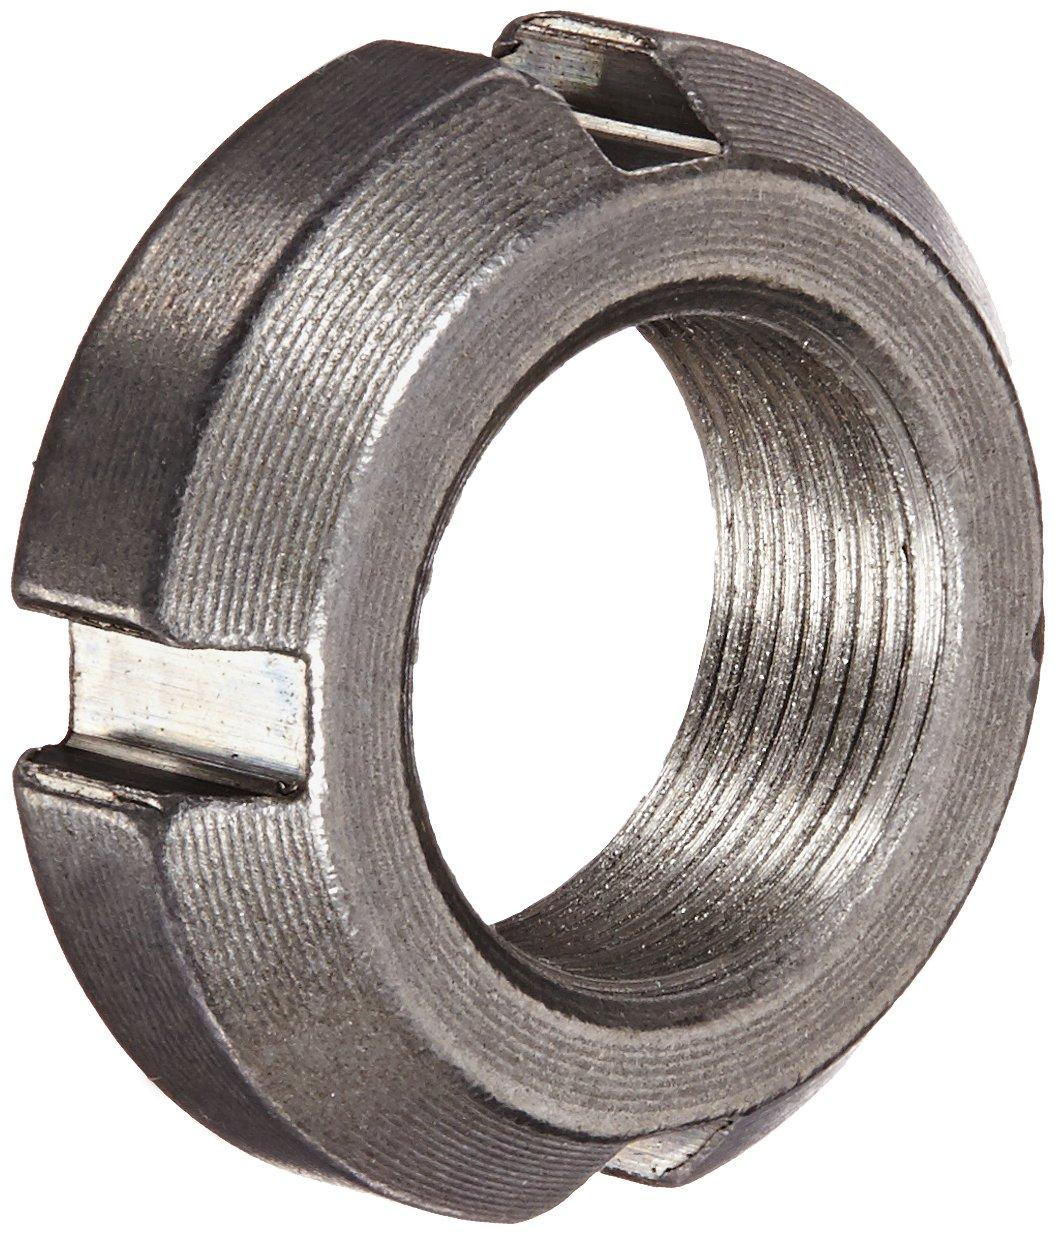 Right Hand M120 Thread 12 Threads per Inch SKF AN 24 Locknut Steel